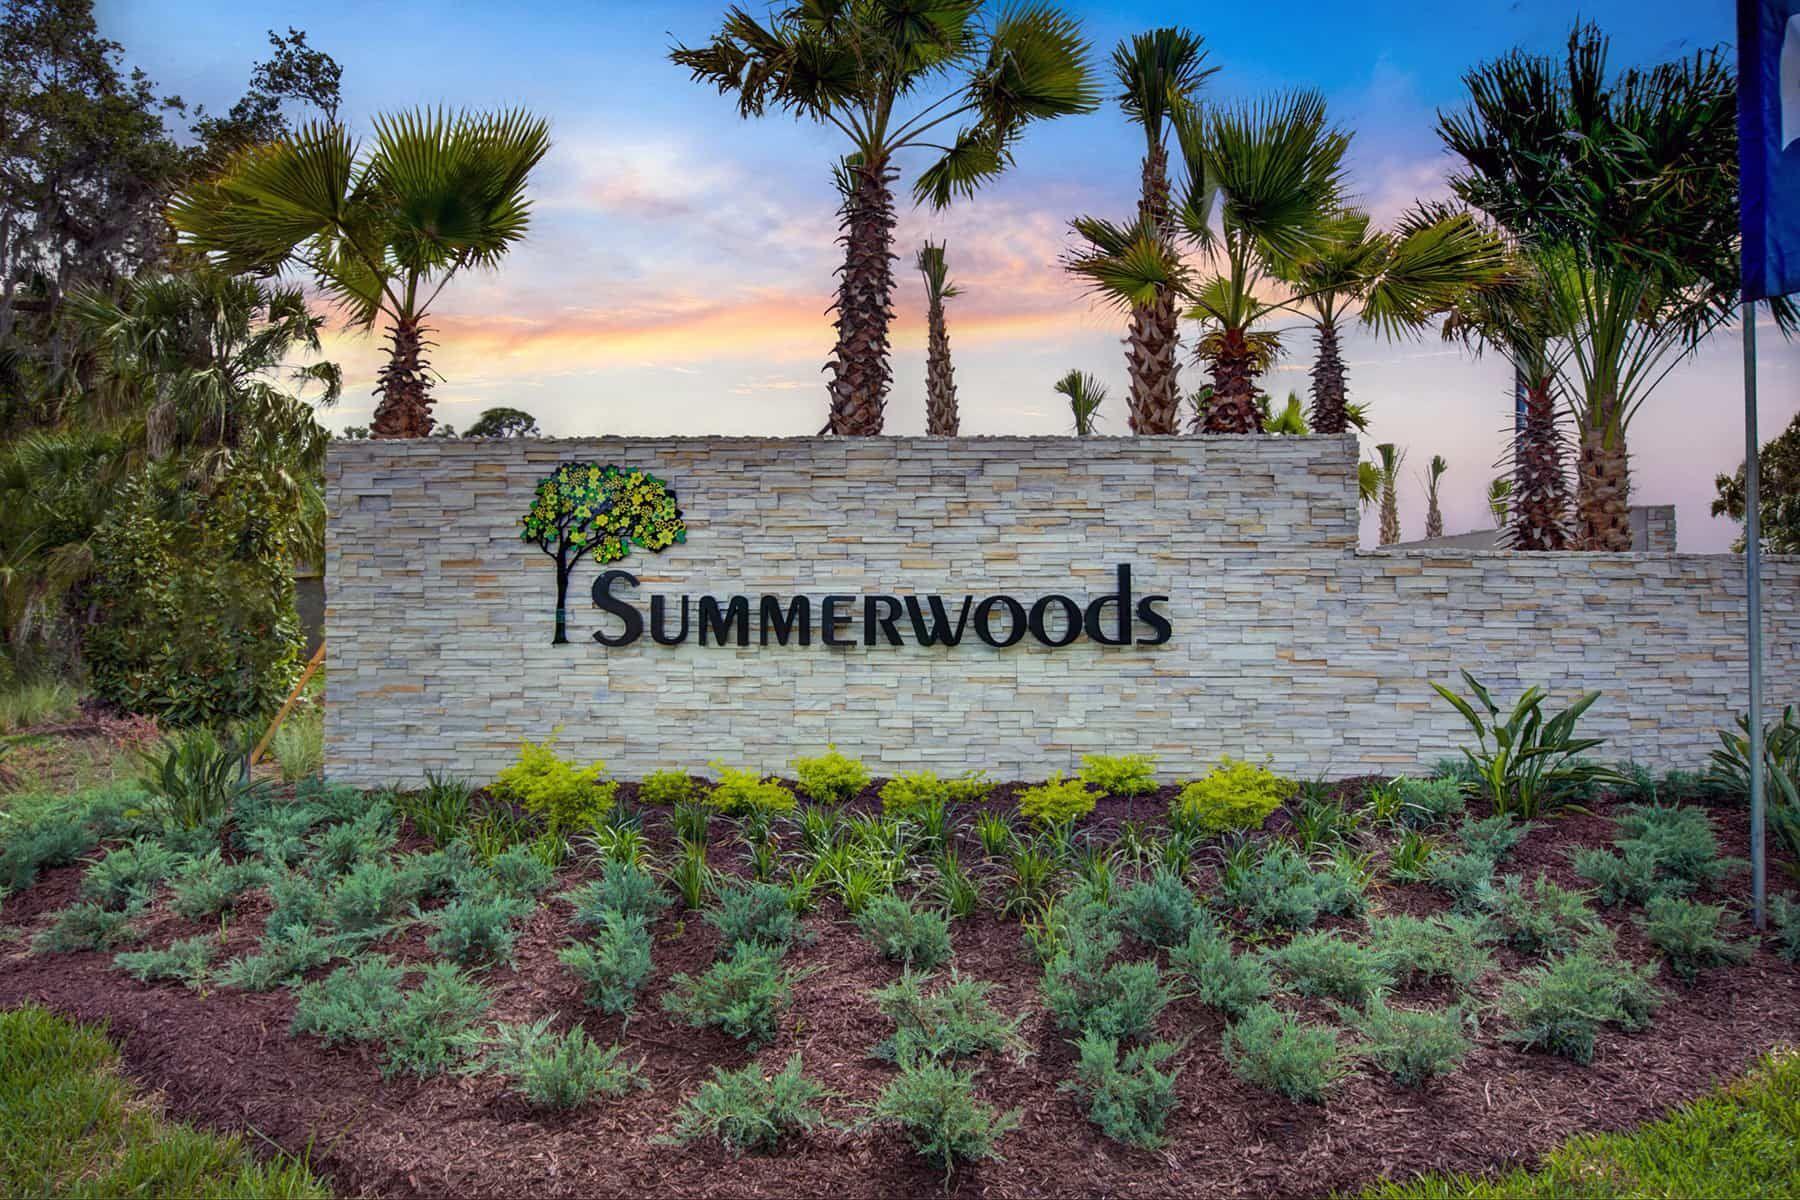 Summerwoods Entrance